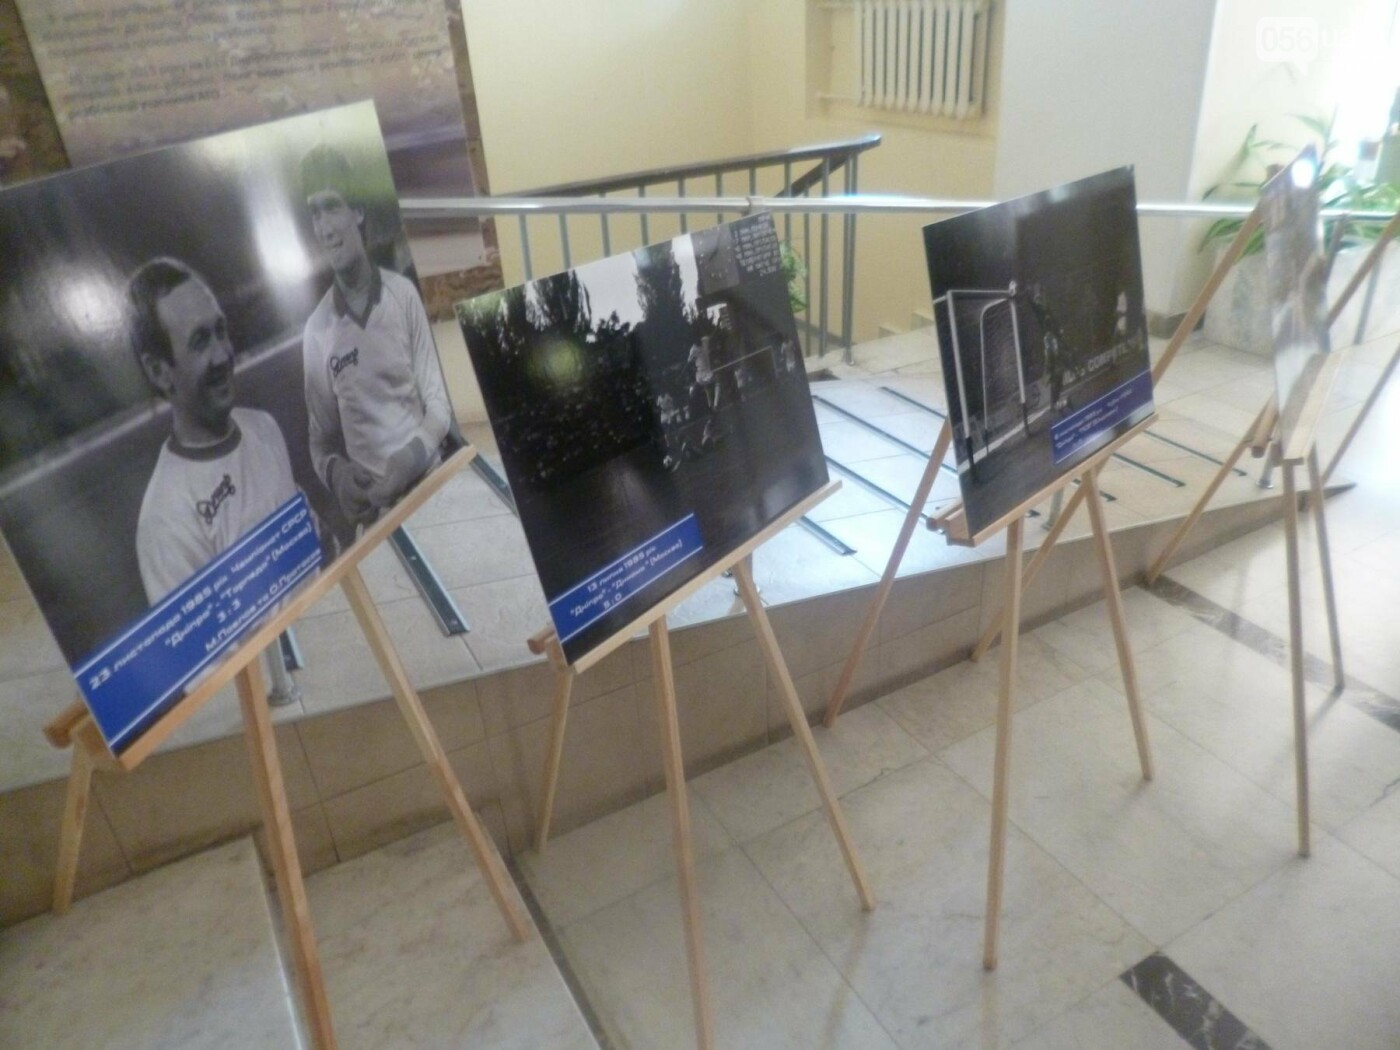 В Днепре отметили 100-летие создания ФК «Днепр», - ФОТО, фото-17